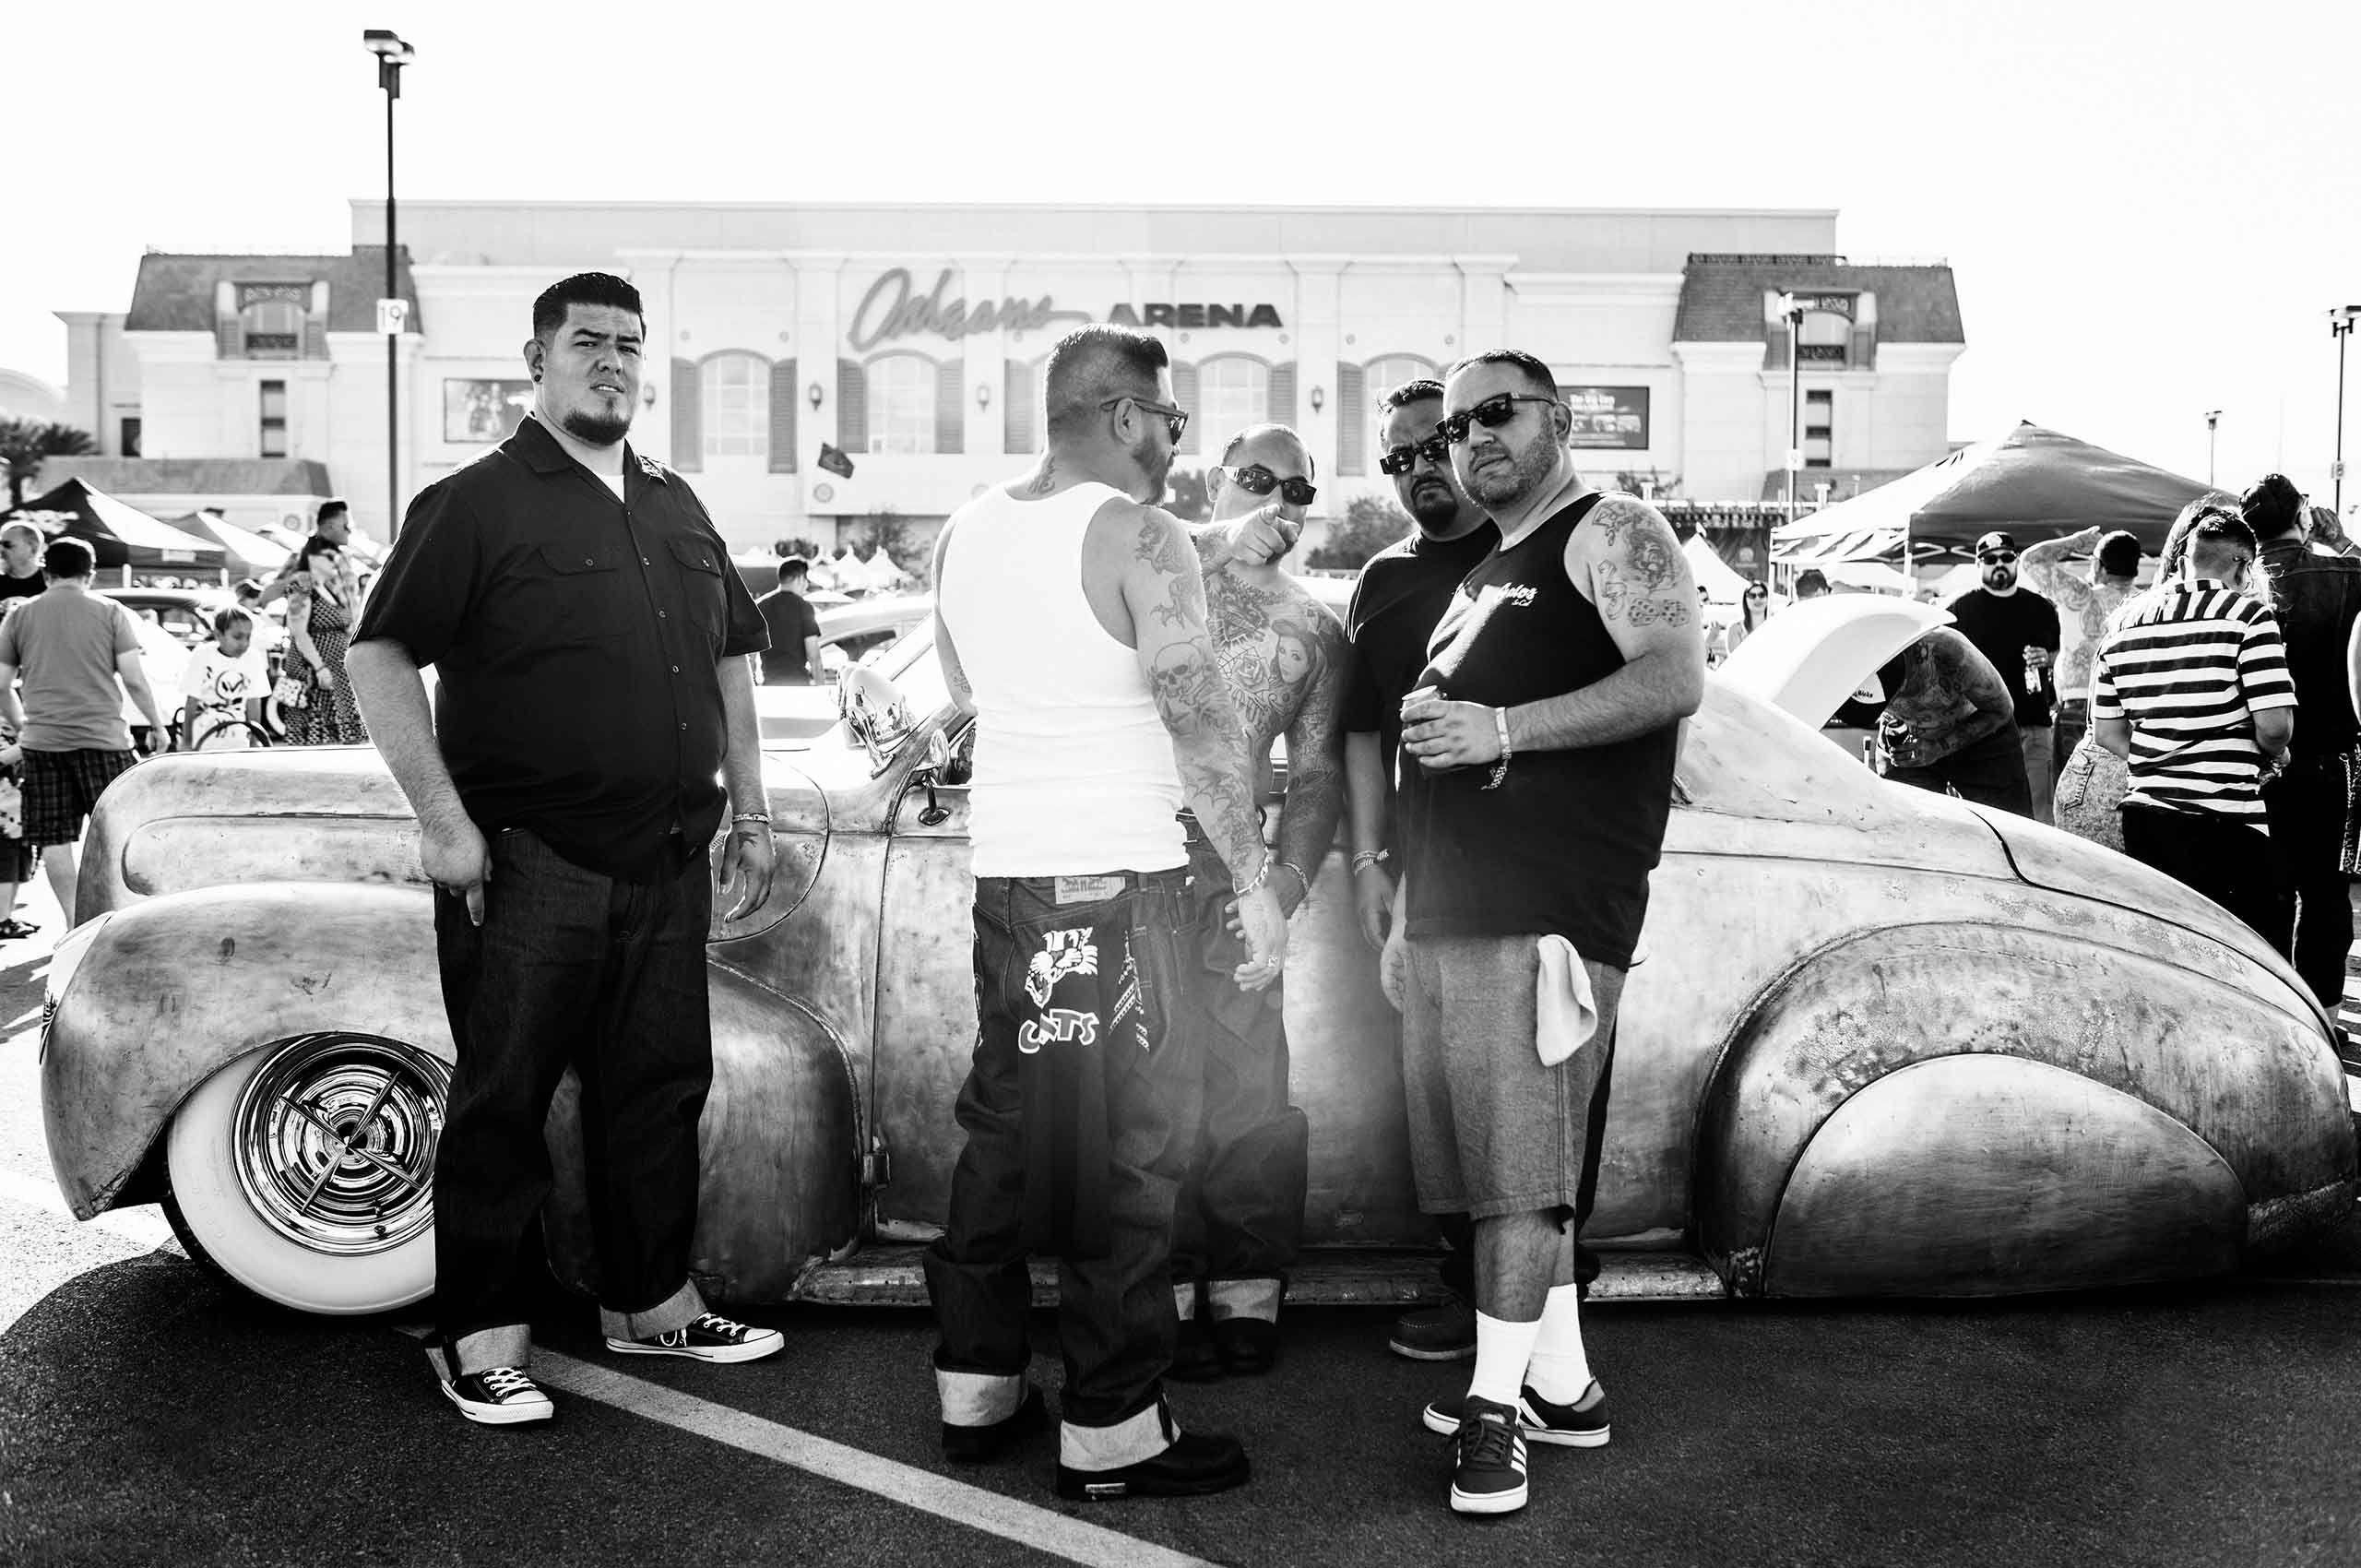 rockabilly-posse-vivalasvegas-rockabillyweekend-lasvegas-by-henrikolundphotography.jpg